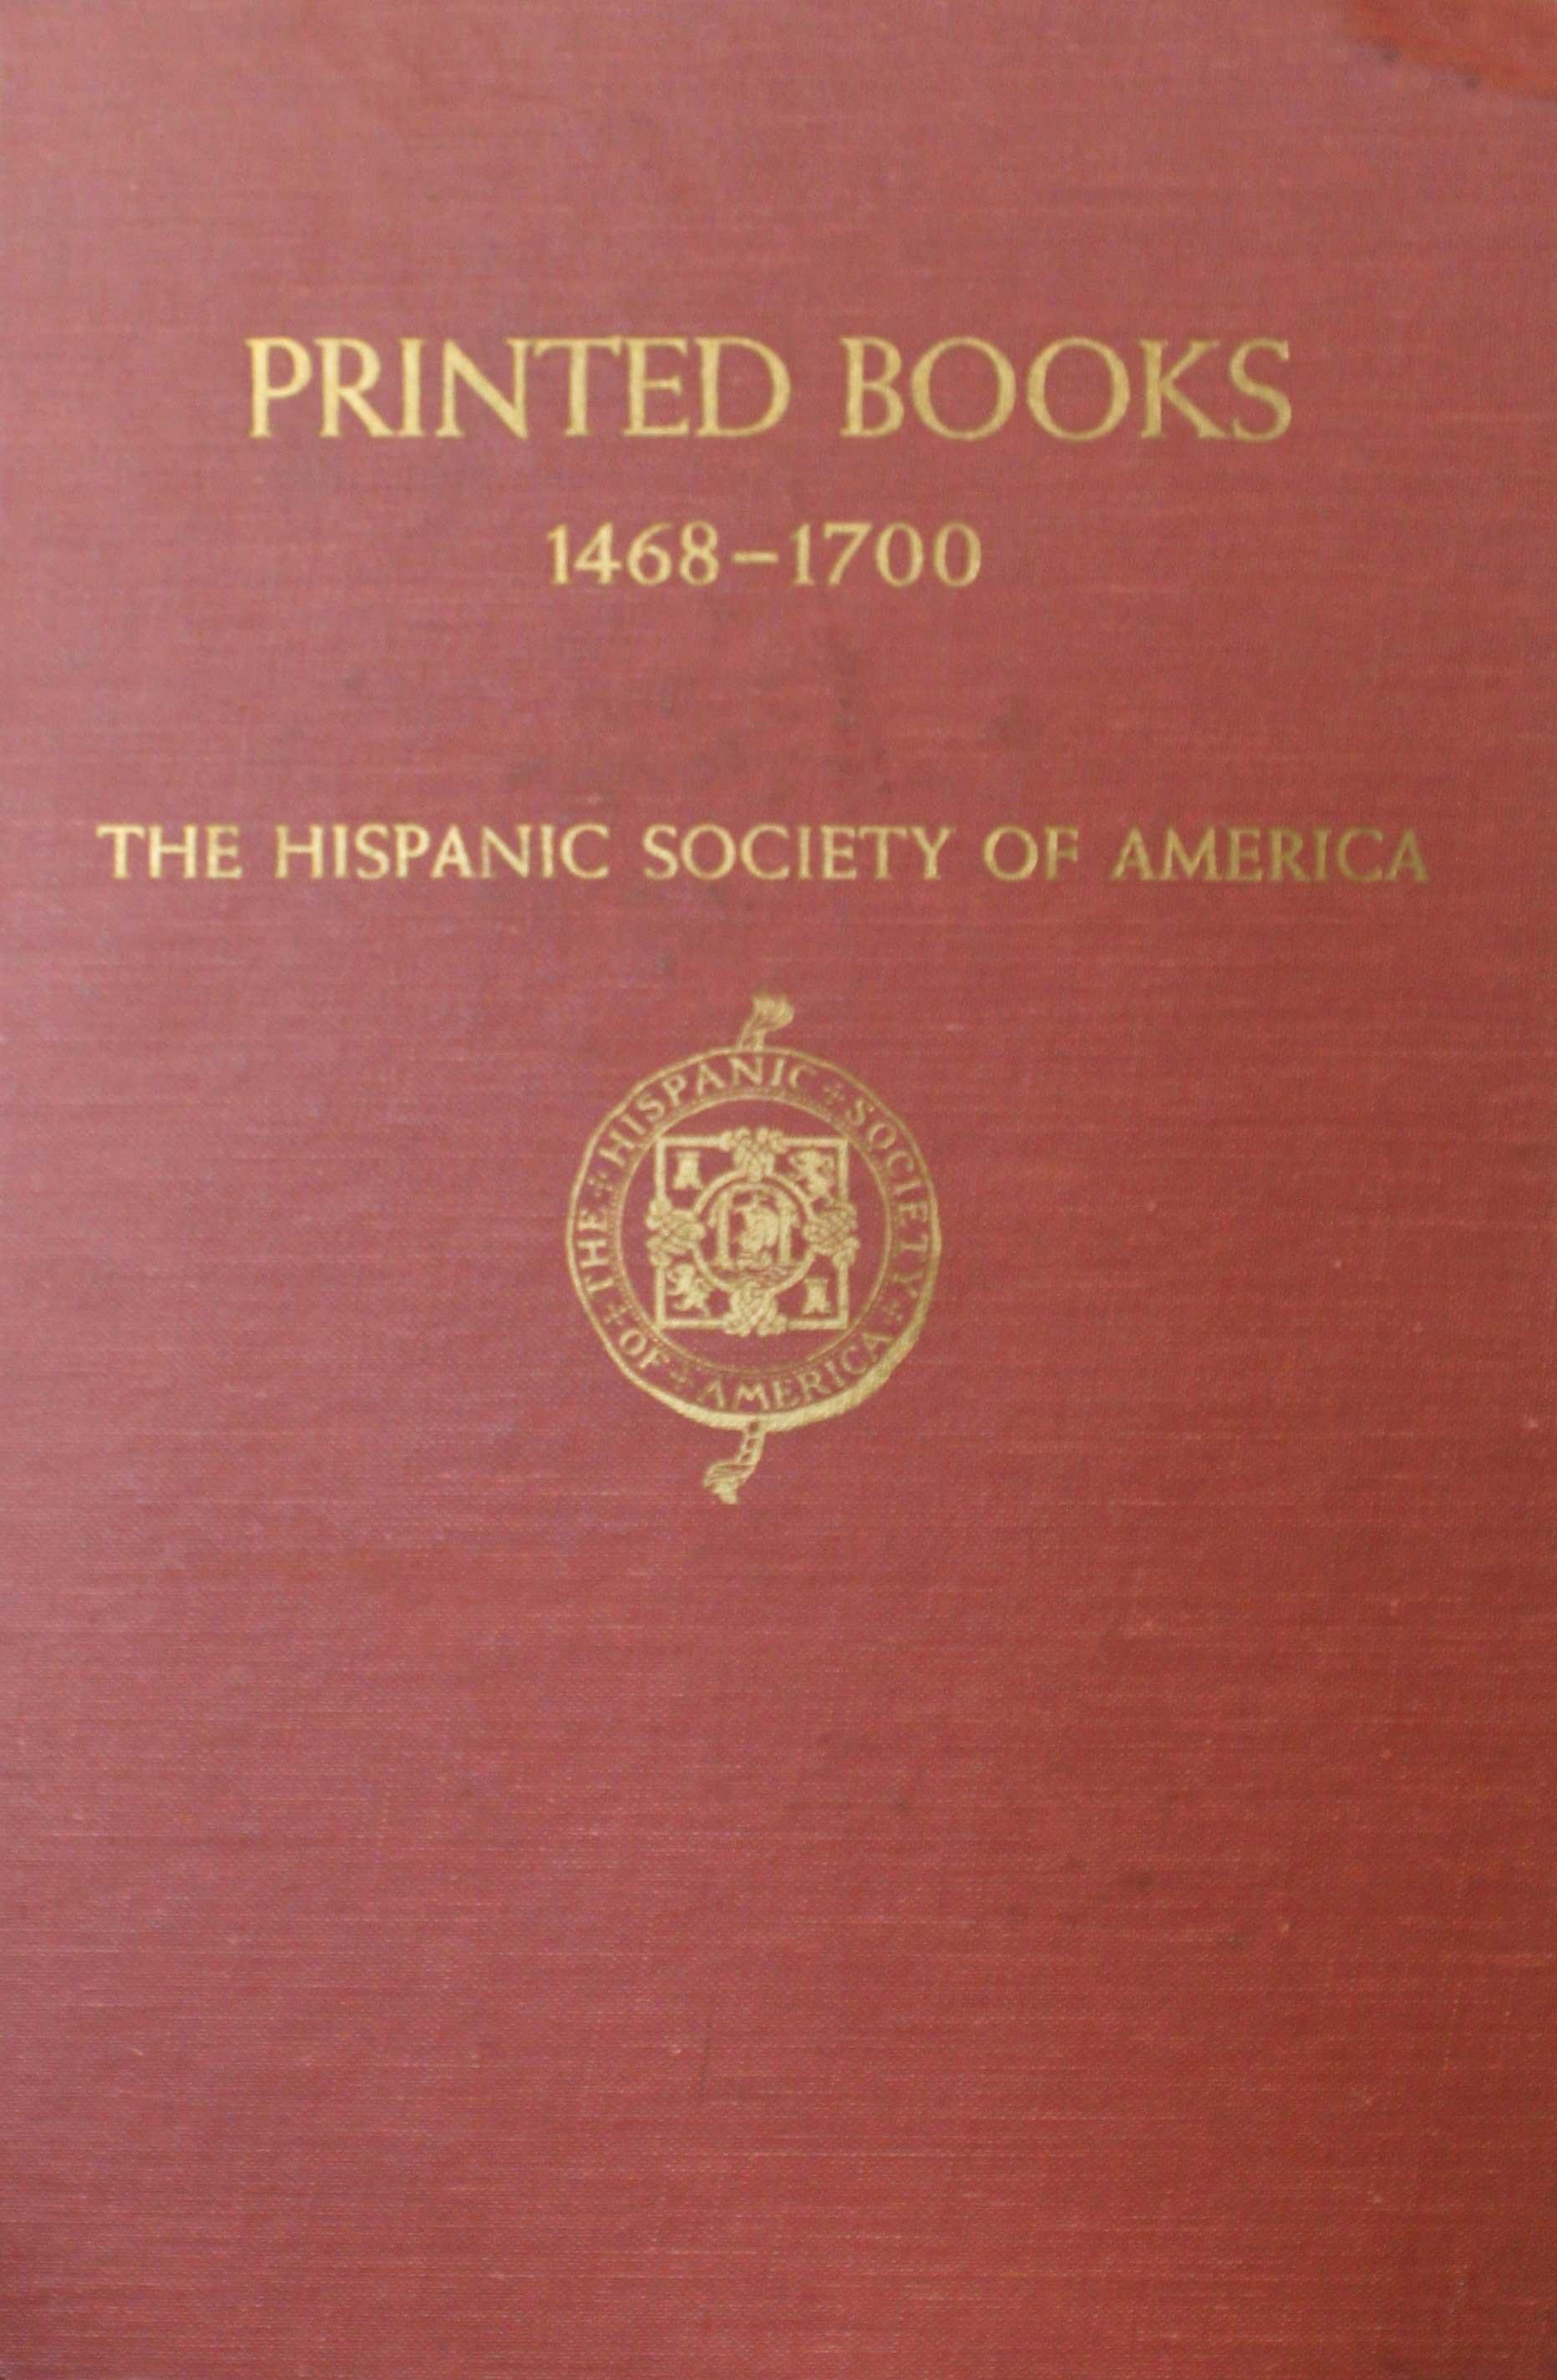 printed_books_1468_1700